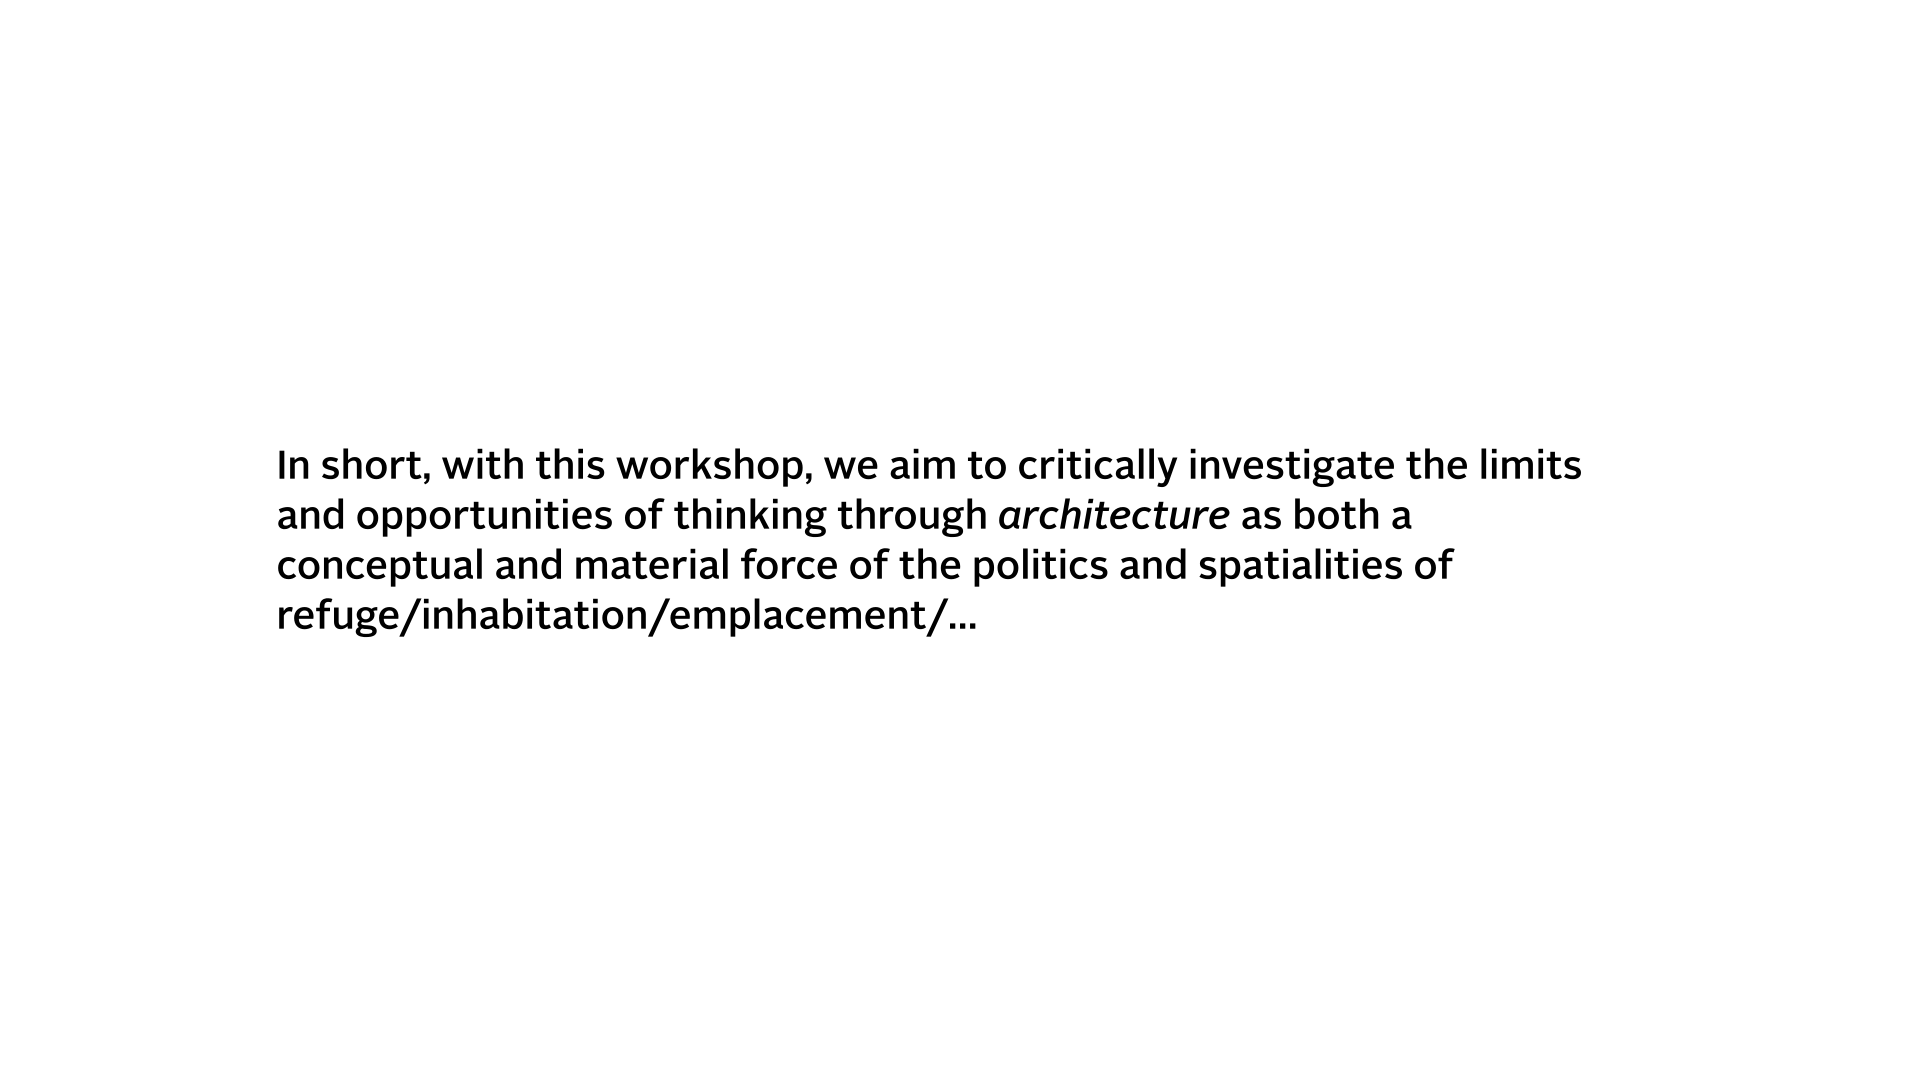 06_Concept_05